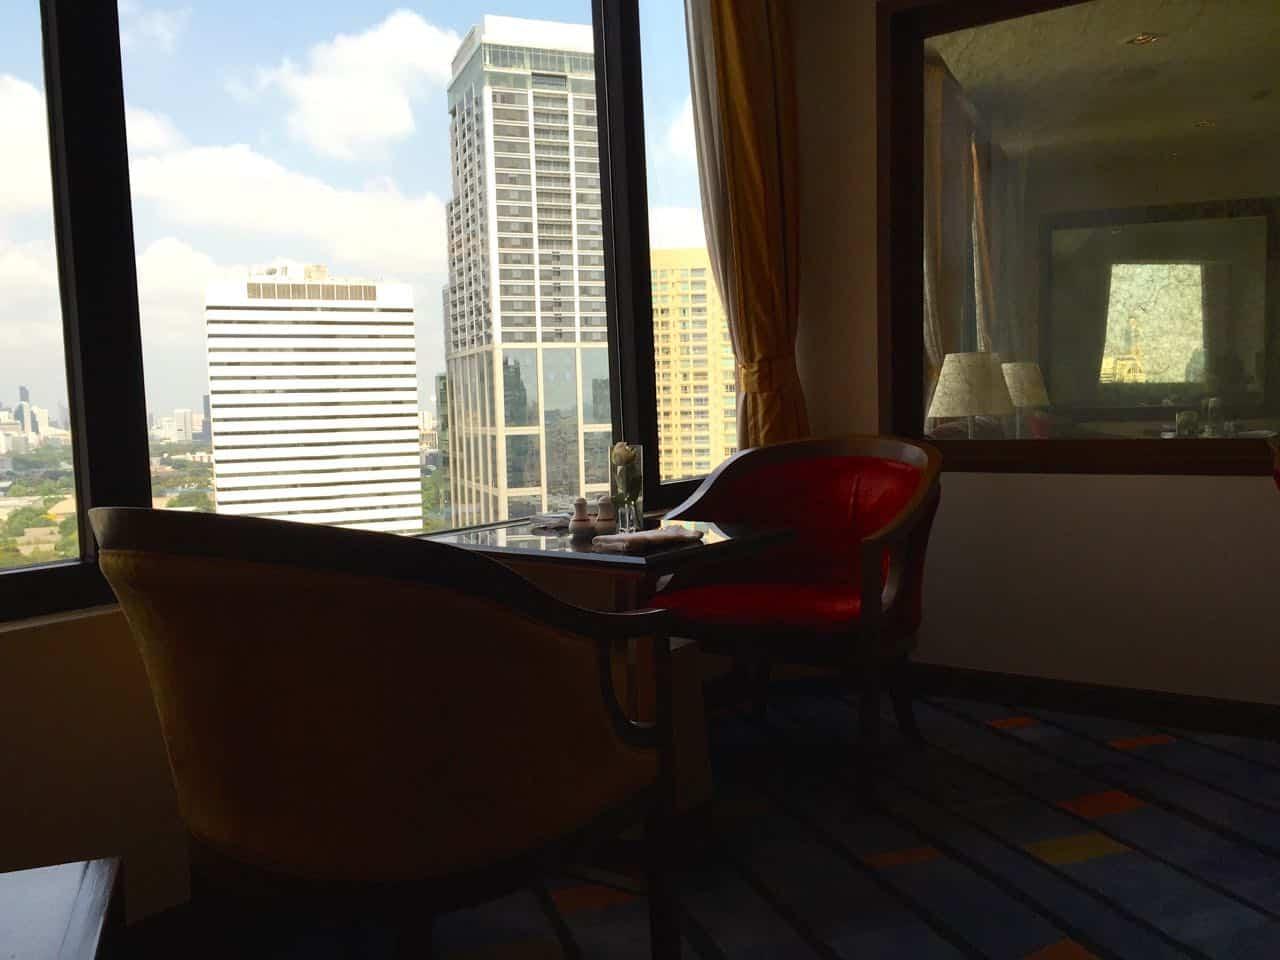 Rembrandt Hotel - Bangkok, Thailand